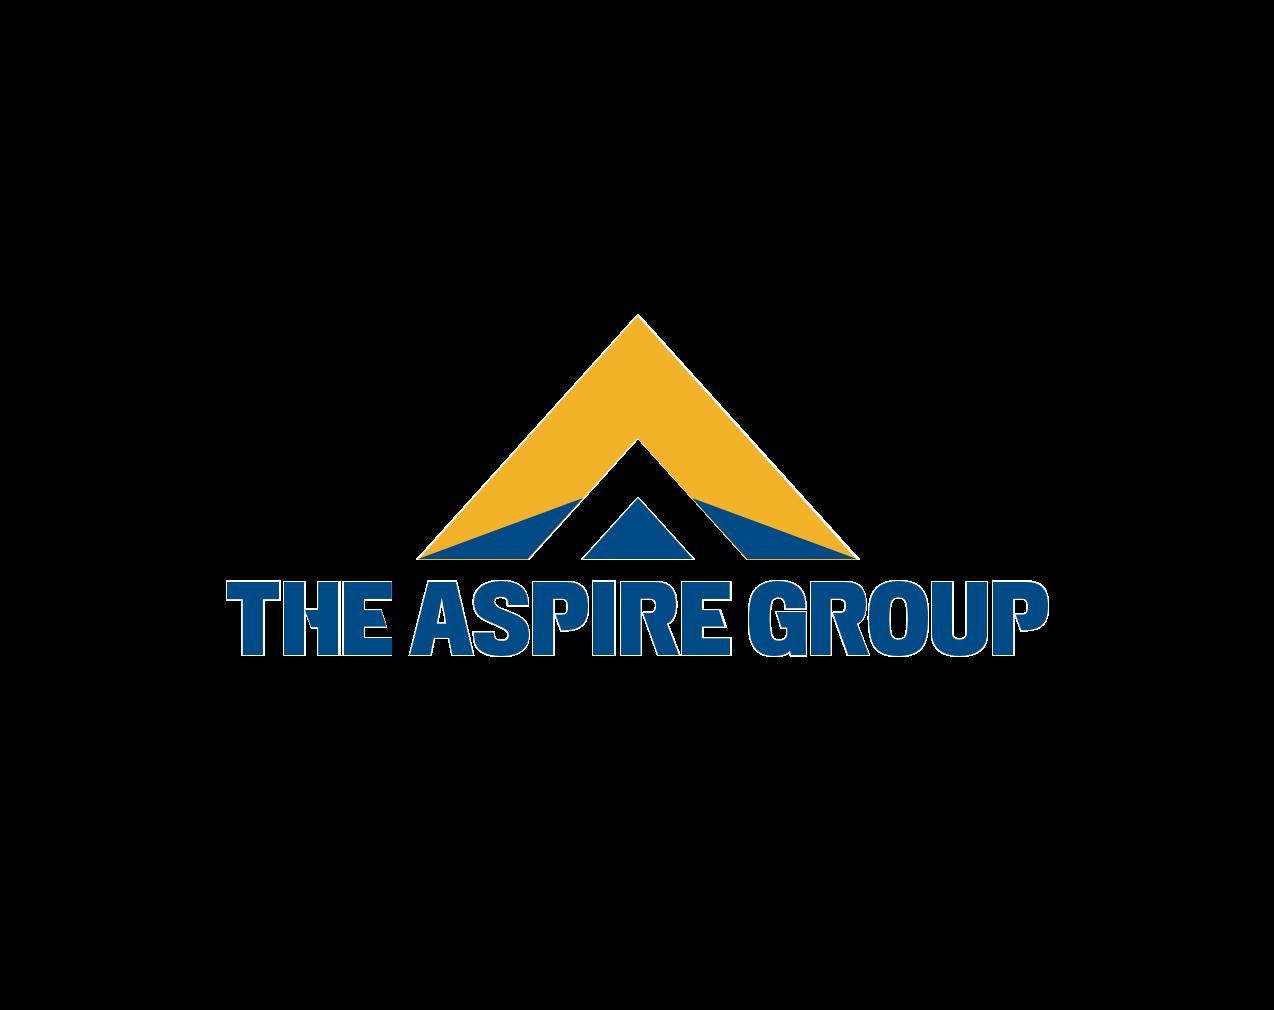 theAspireGroup.png